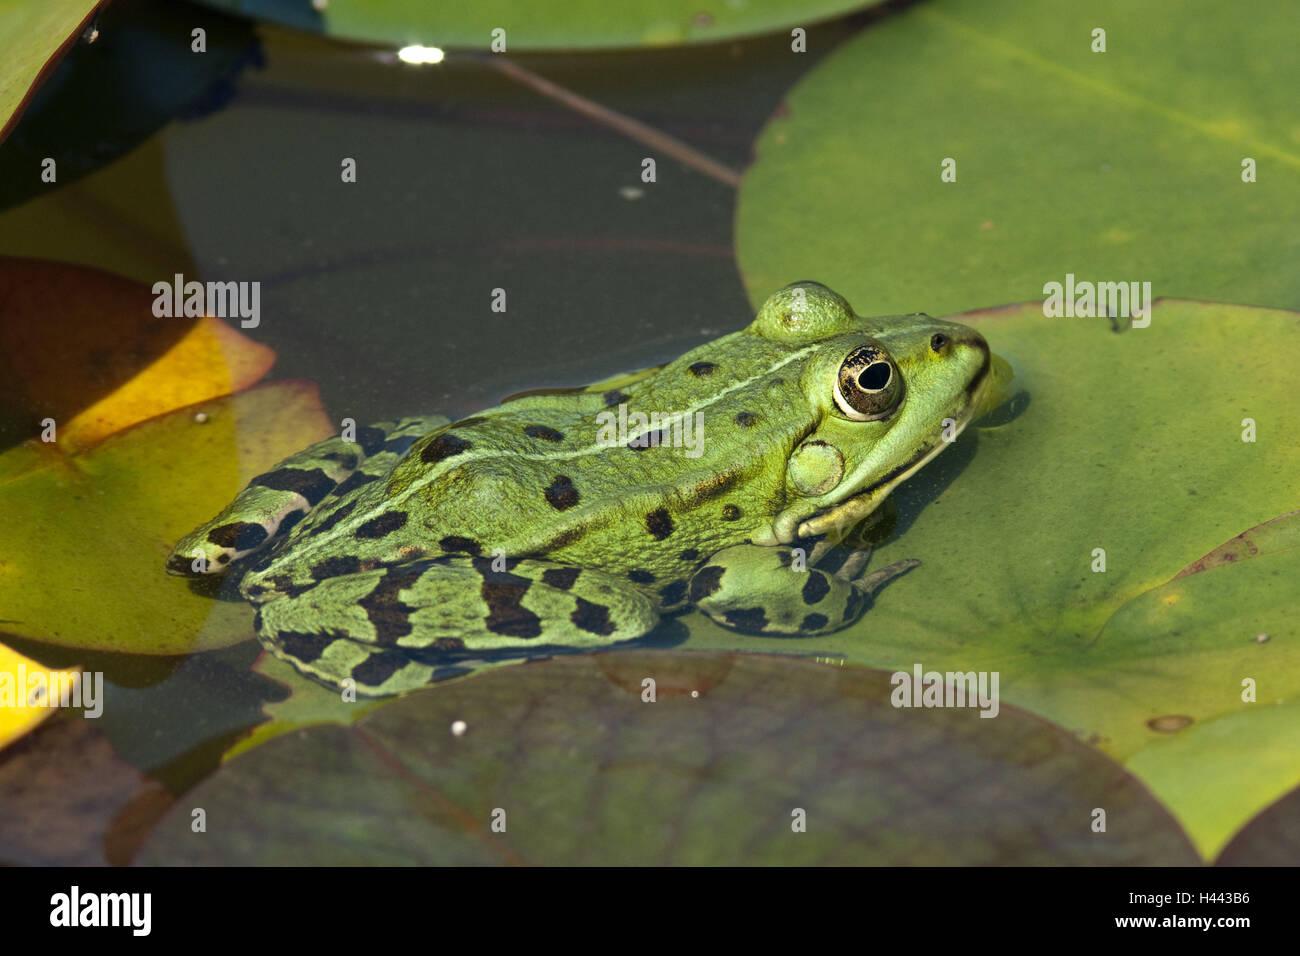 Pond frog, Rana esculenta, - Stock Image